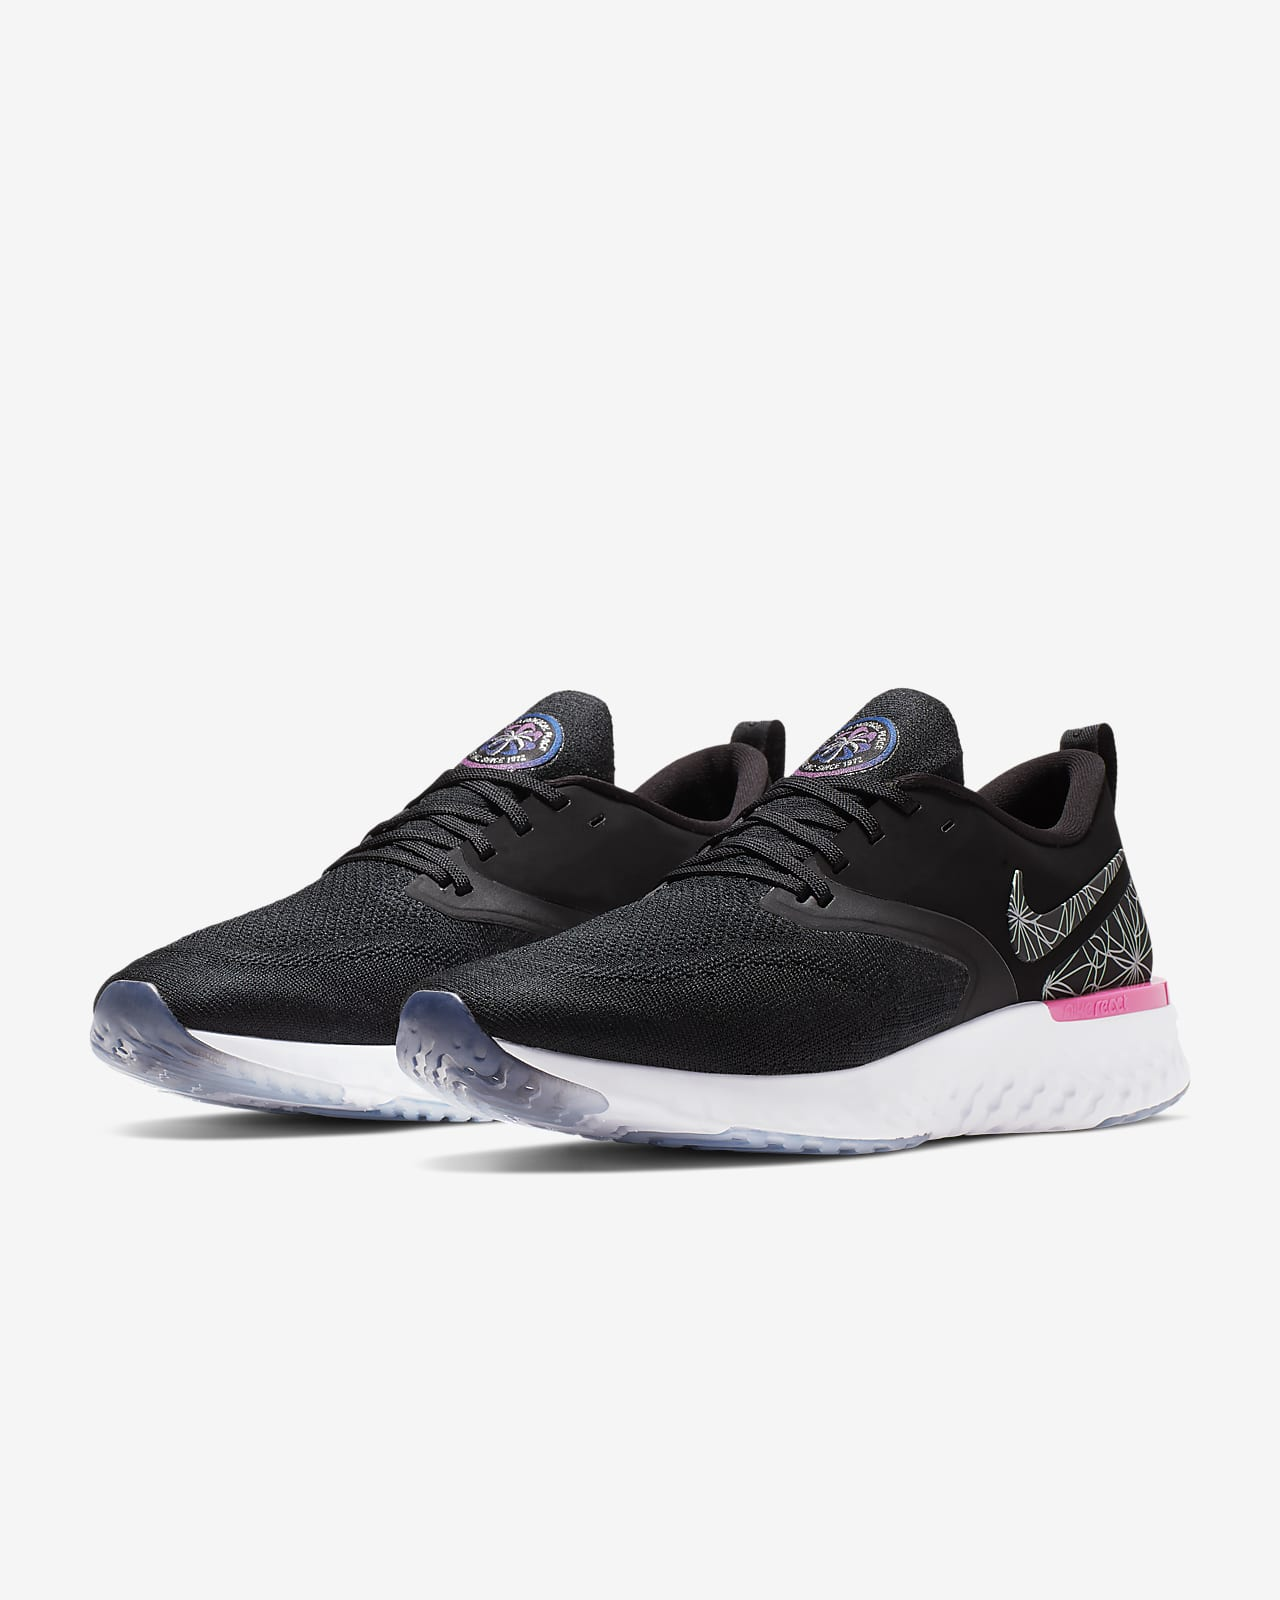 Nike ODYSSEY REACT FLYKNIT 2 Herren Neutralschuhe AH1015